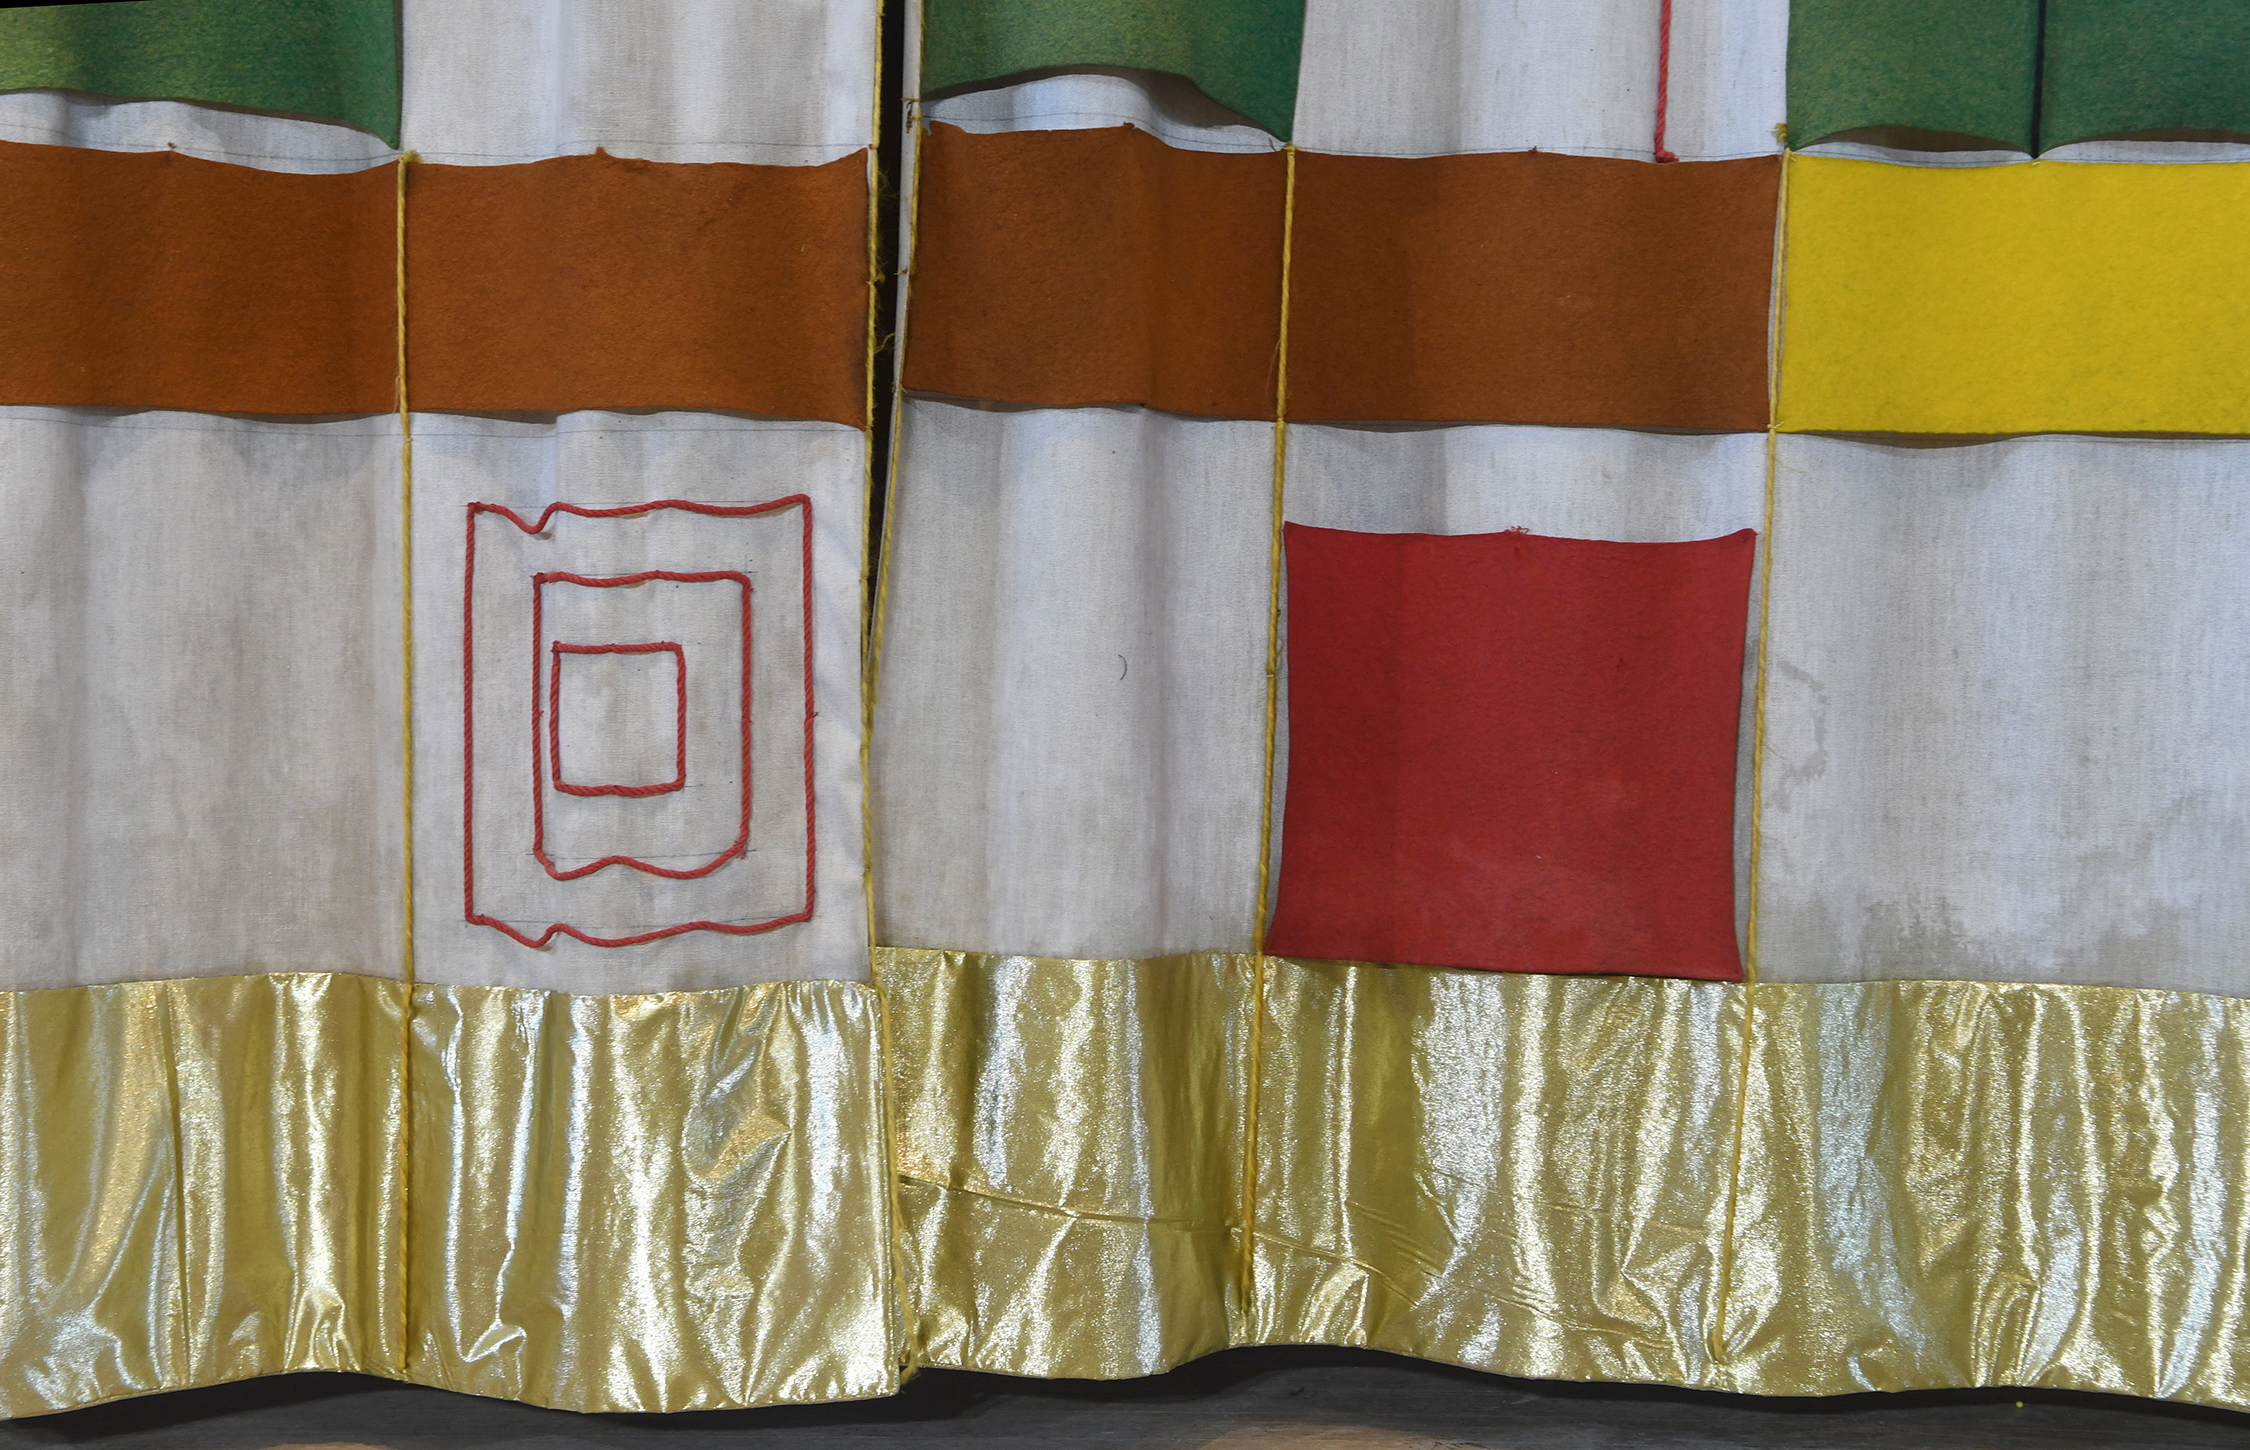 Hillside Curtain 6.16.20 046.jpg